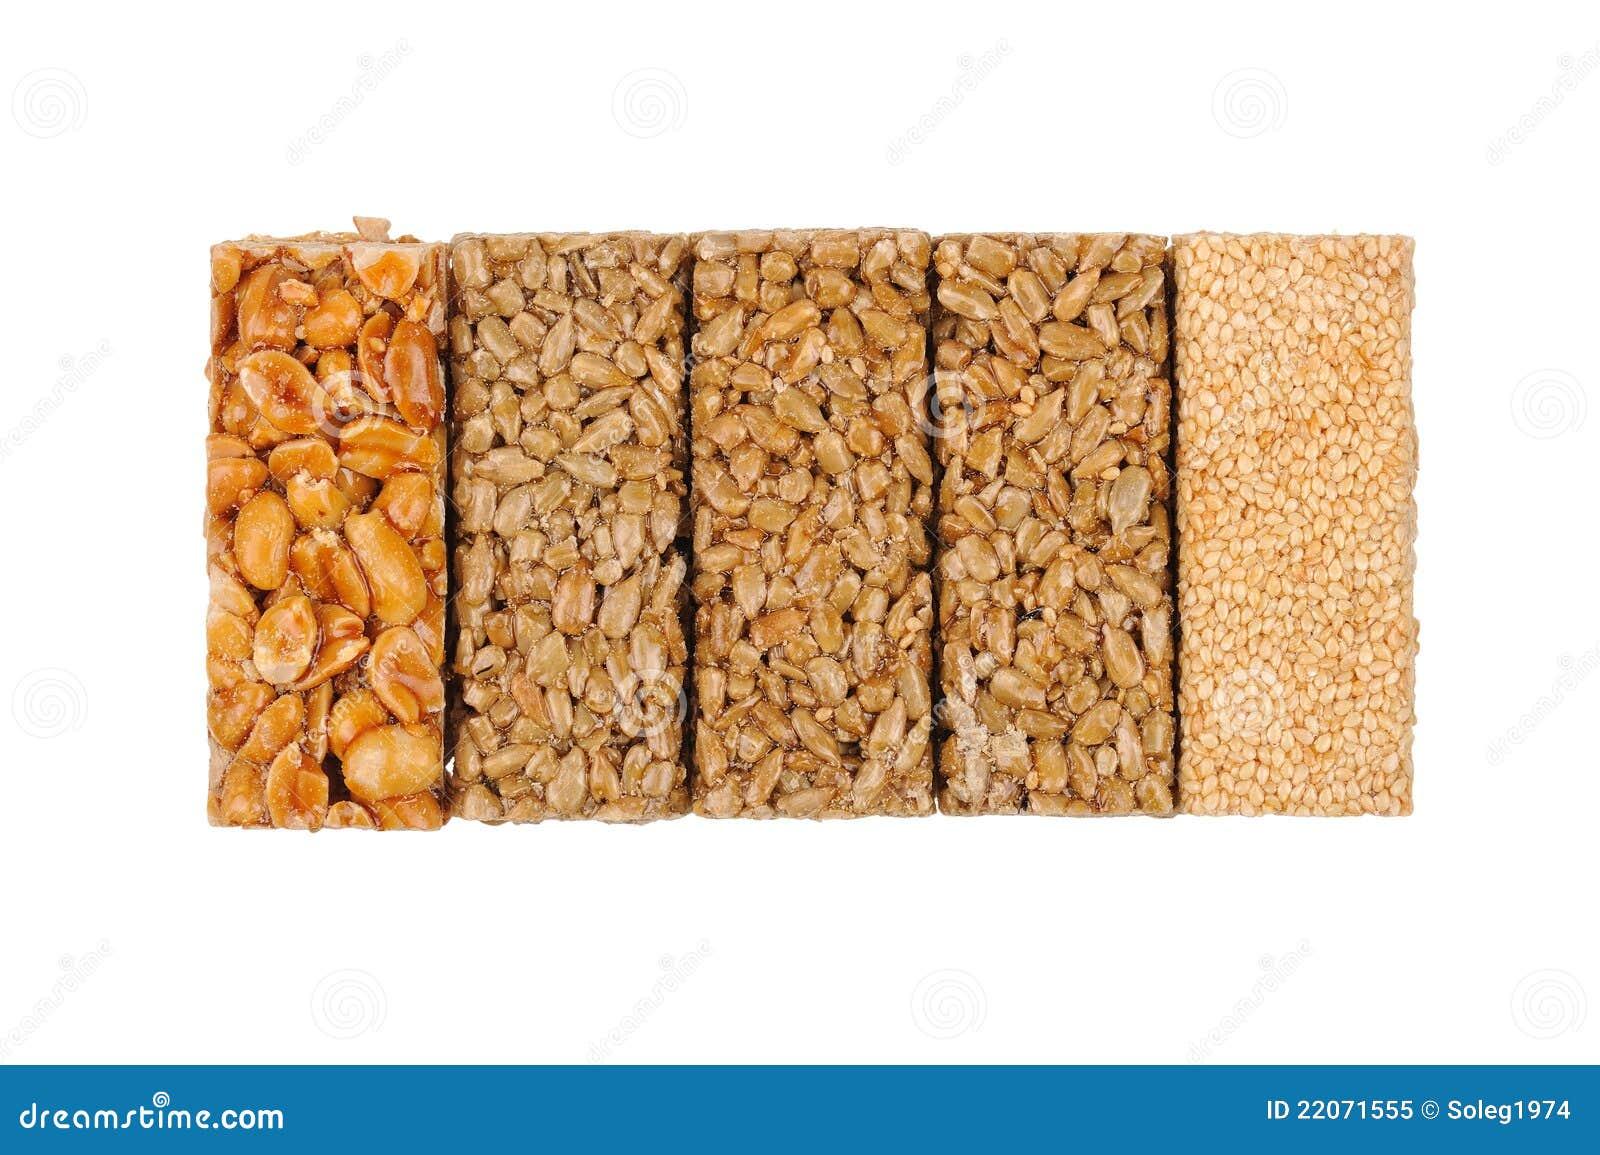 Honey bars. peanuts, sesame and sunflower seeds